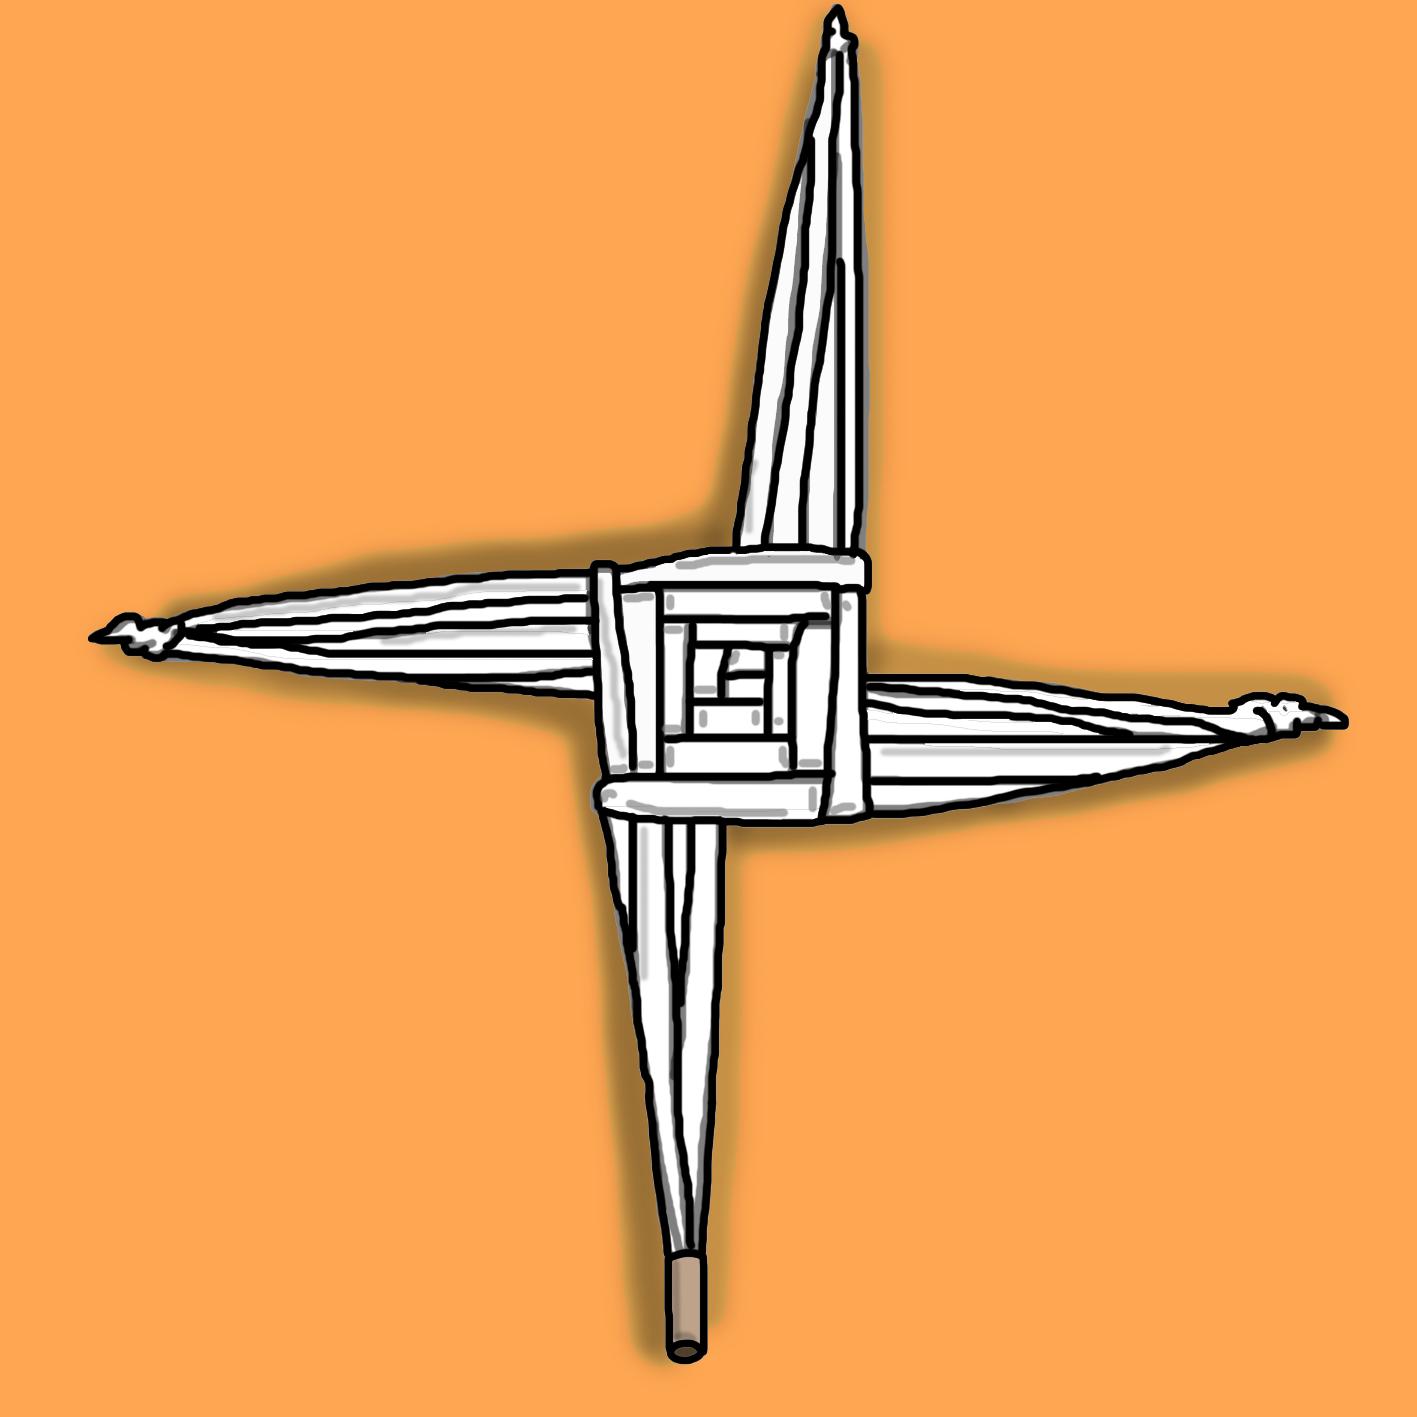 Copy of crossjiont.png